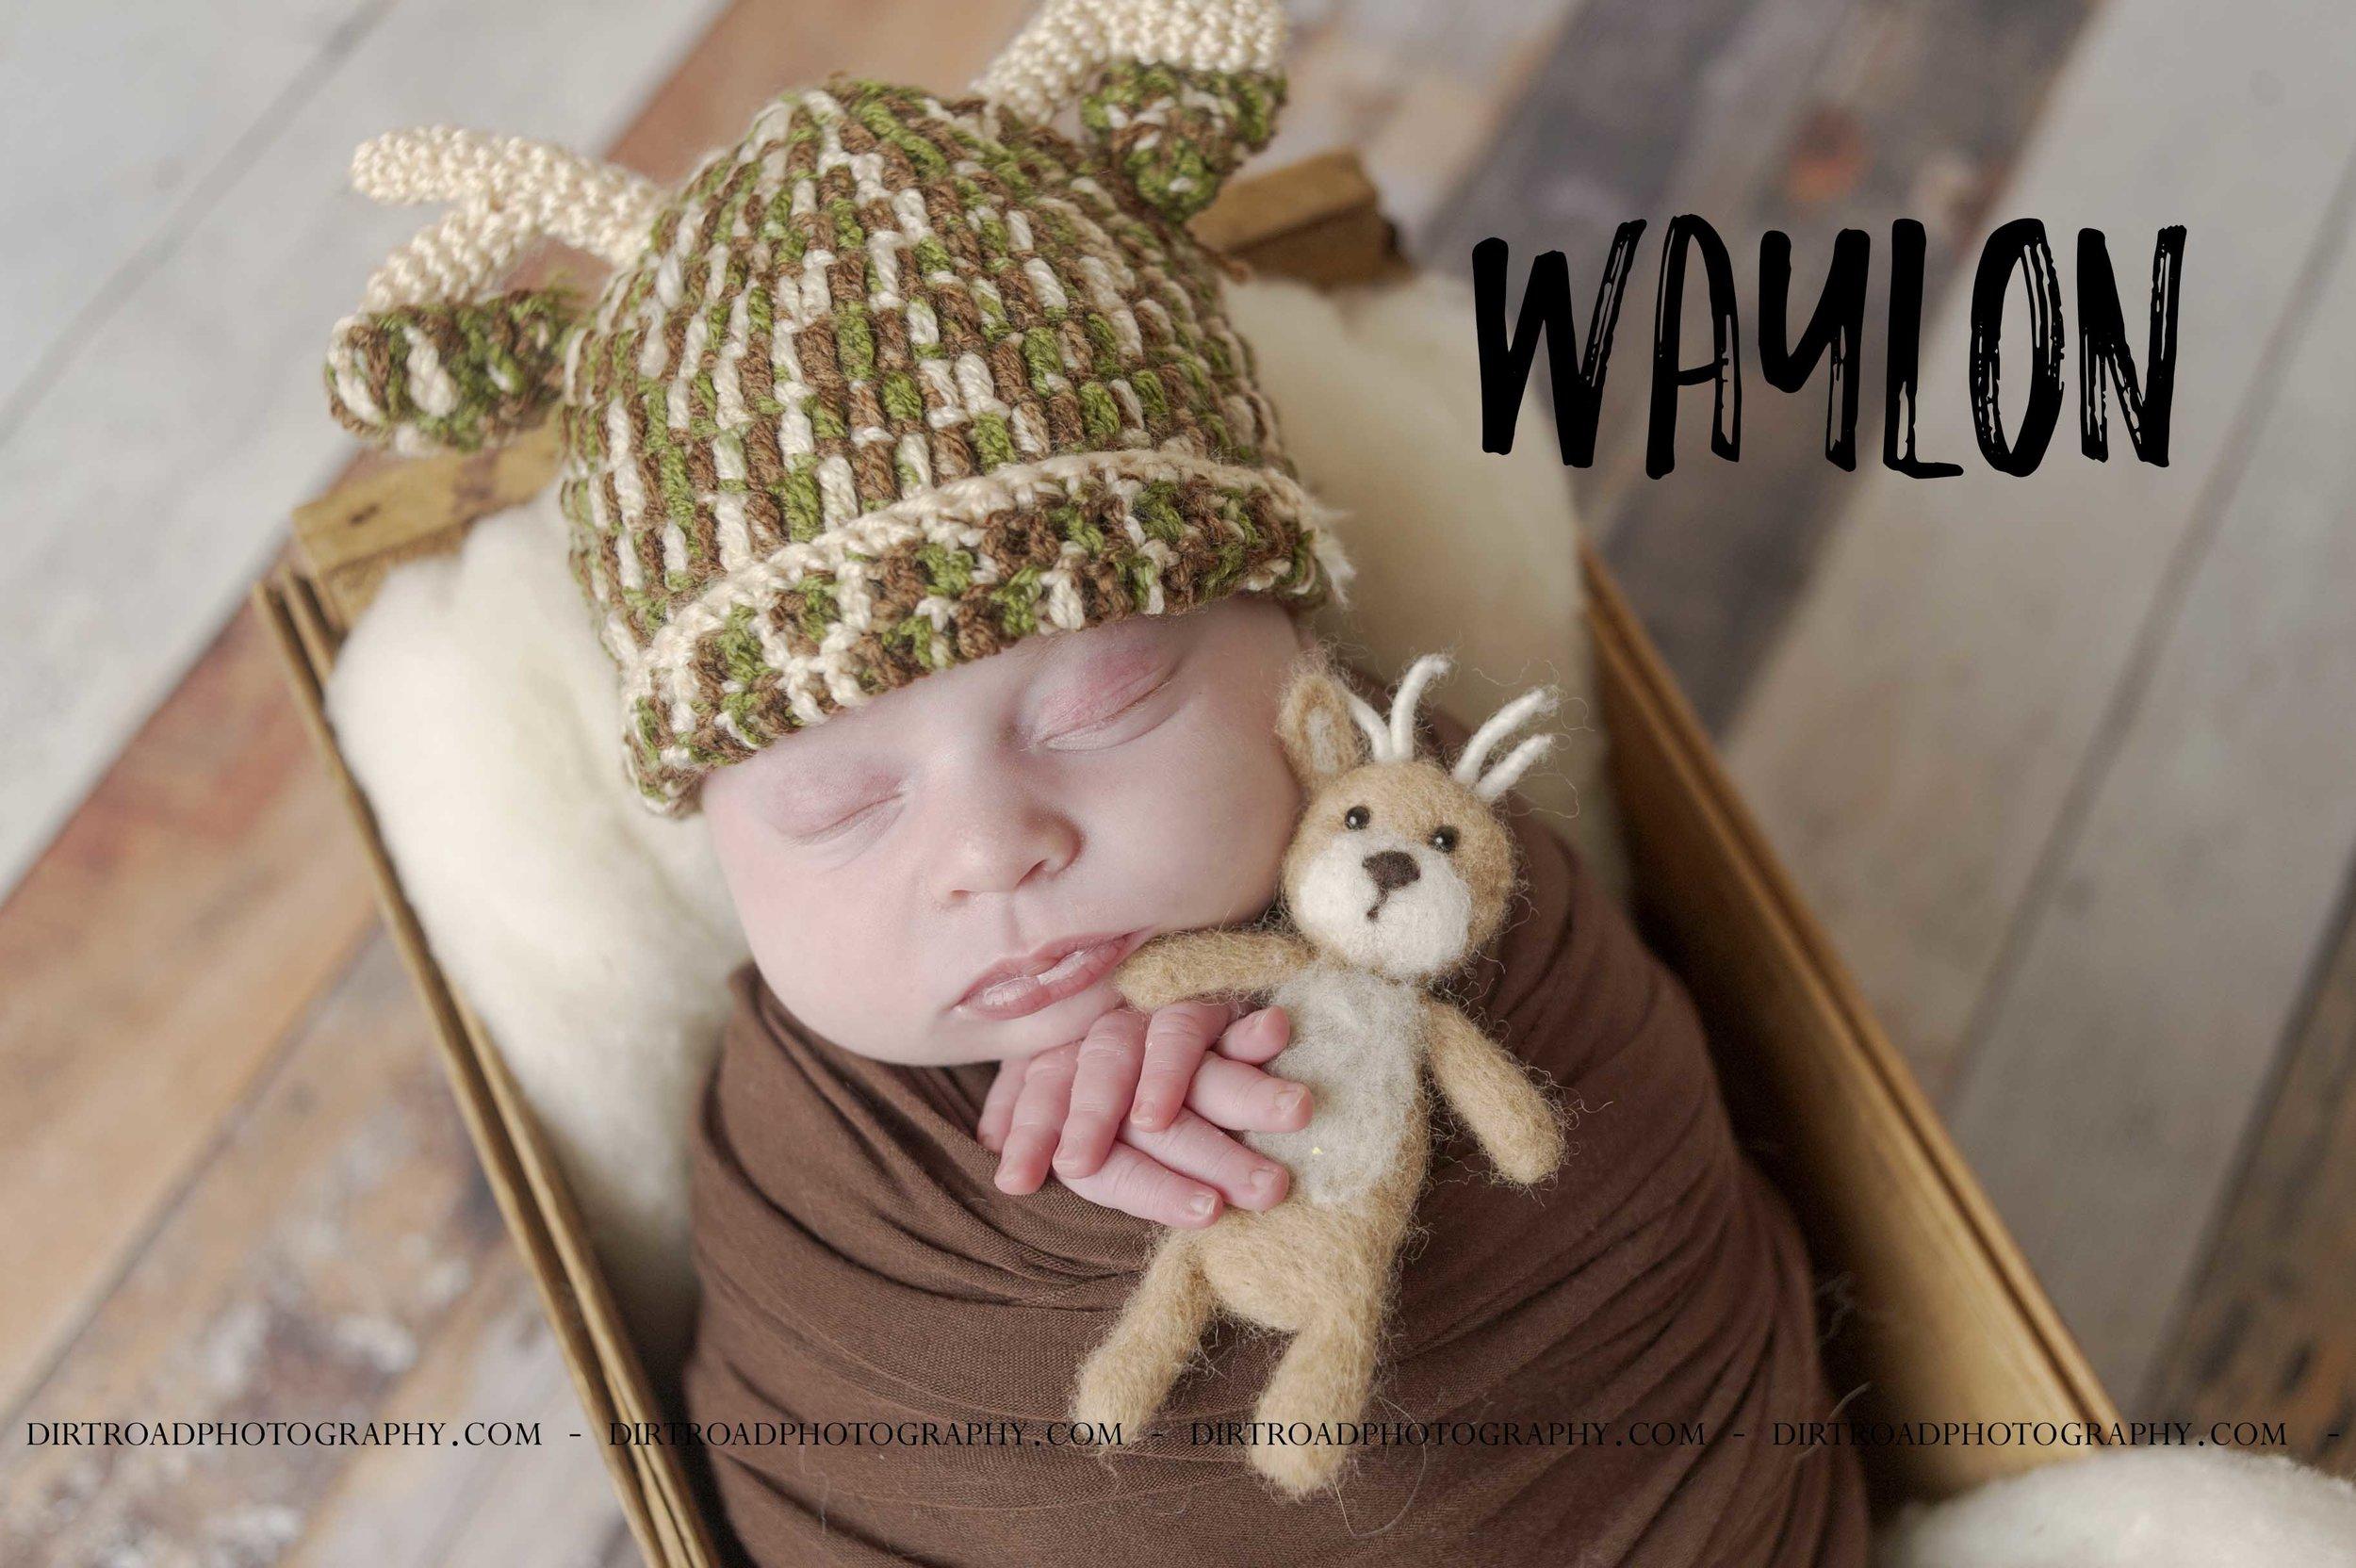 newborn-baby-session-boy-waylon-turquoise-teal-white-wood-floor-photos-southeast-nebraska-photographer-dirt-road-photography-bowl-wrapped-baby-lincoln-nebraska-photographer-located-near-wilber-nebraska-newborn-photography